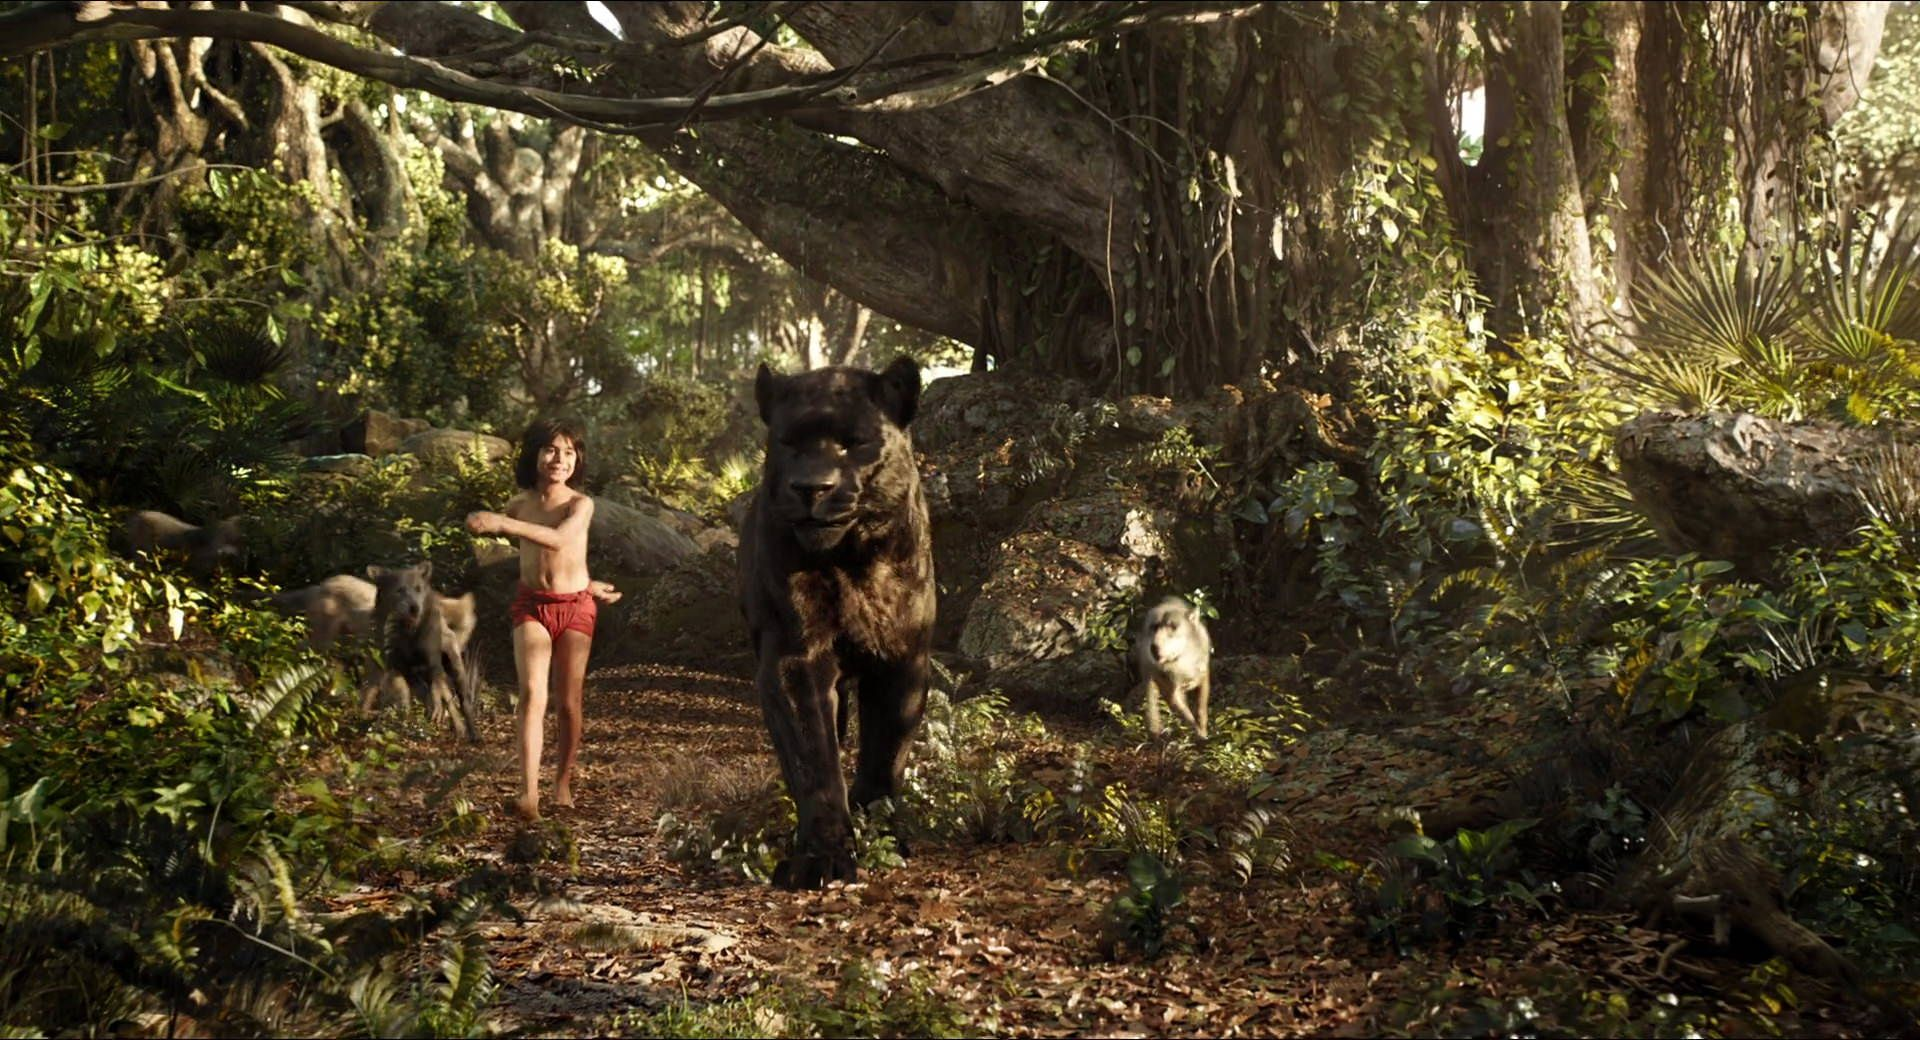 Screencap gallery for the jungle book 2016 1080p bluray disney live